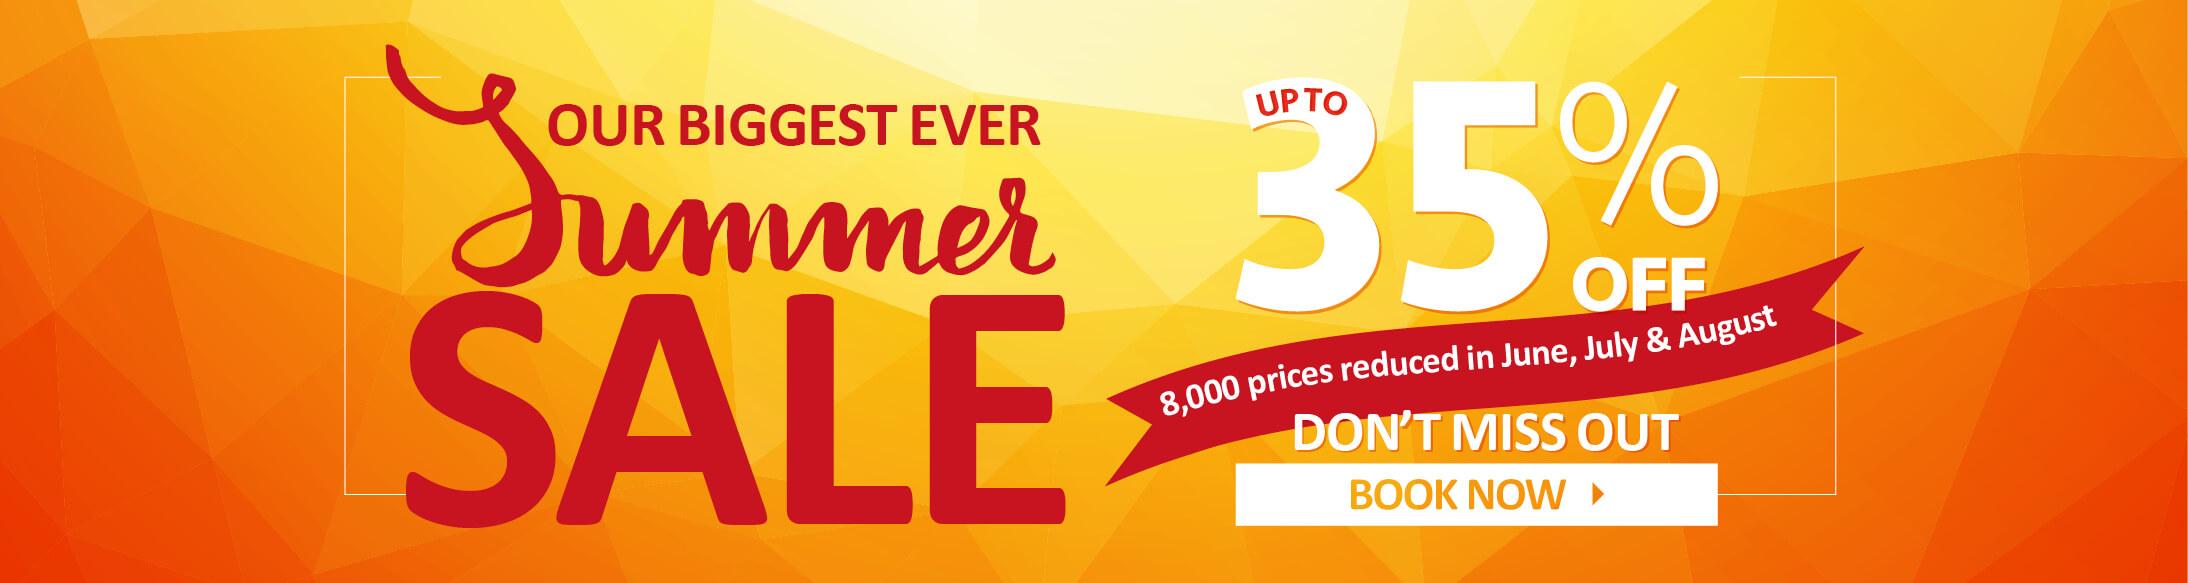 sykes summer sale